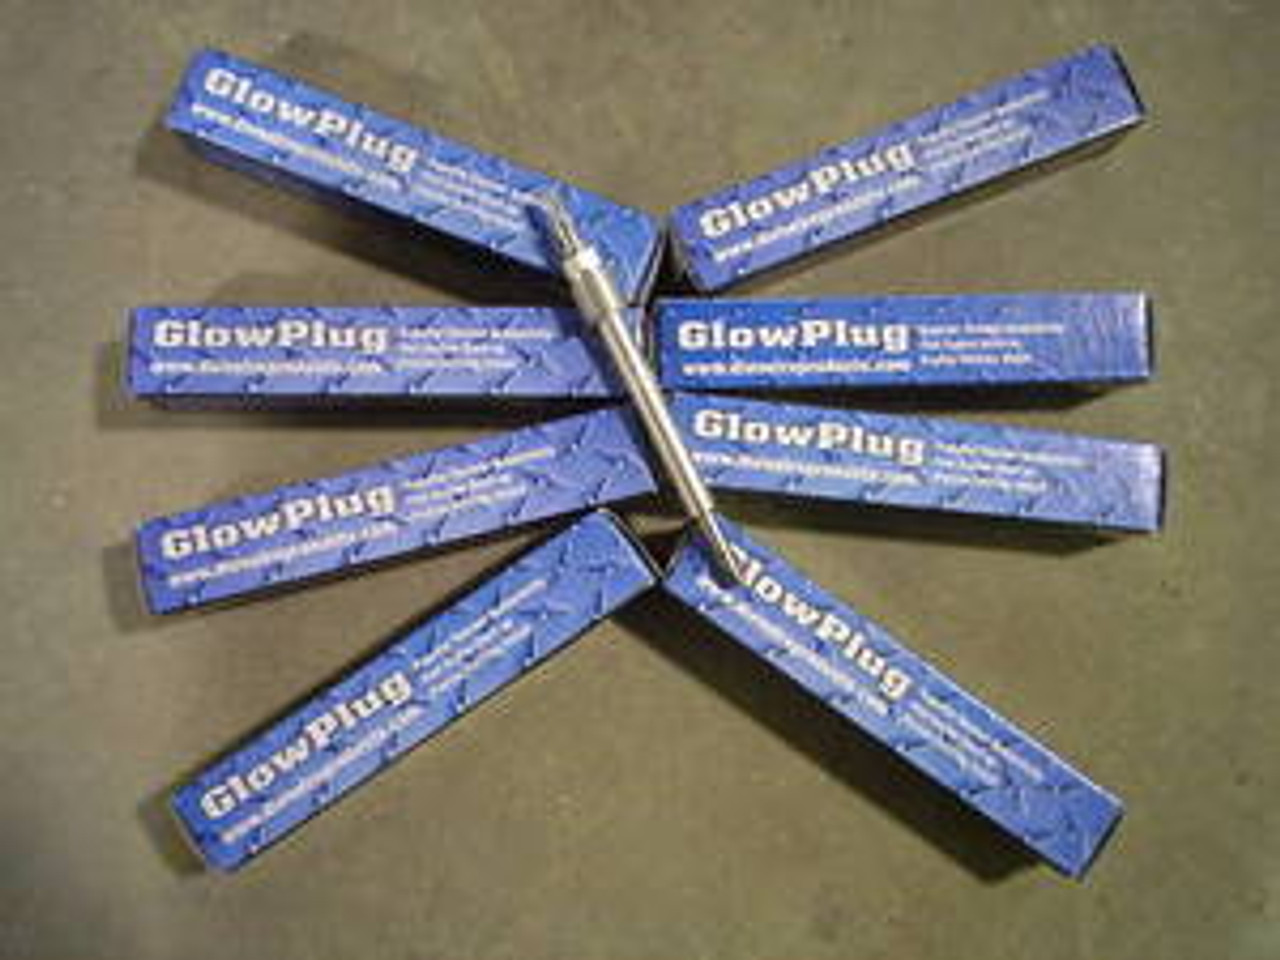 03-07 Ford Powerstroke 6.0 Diesel Glowplugs Glow Plugs